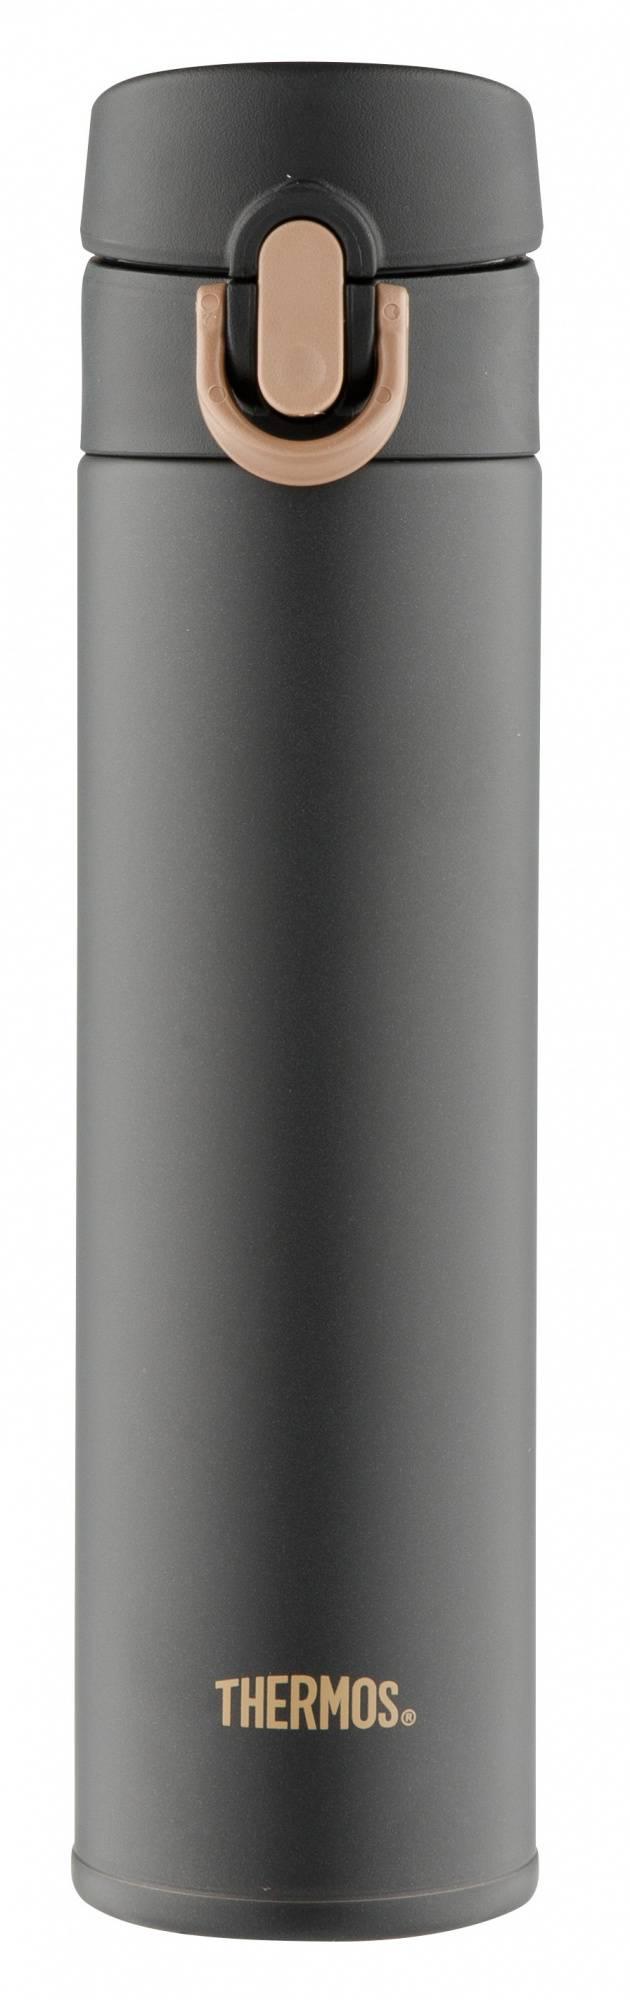 Термос Thermos JNI-401-MTBK SS черный - фото 1